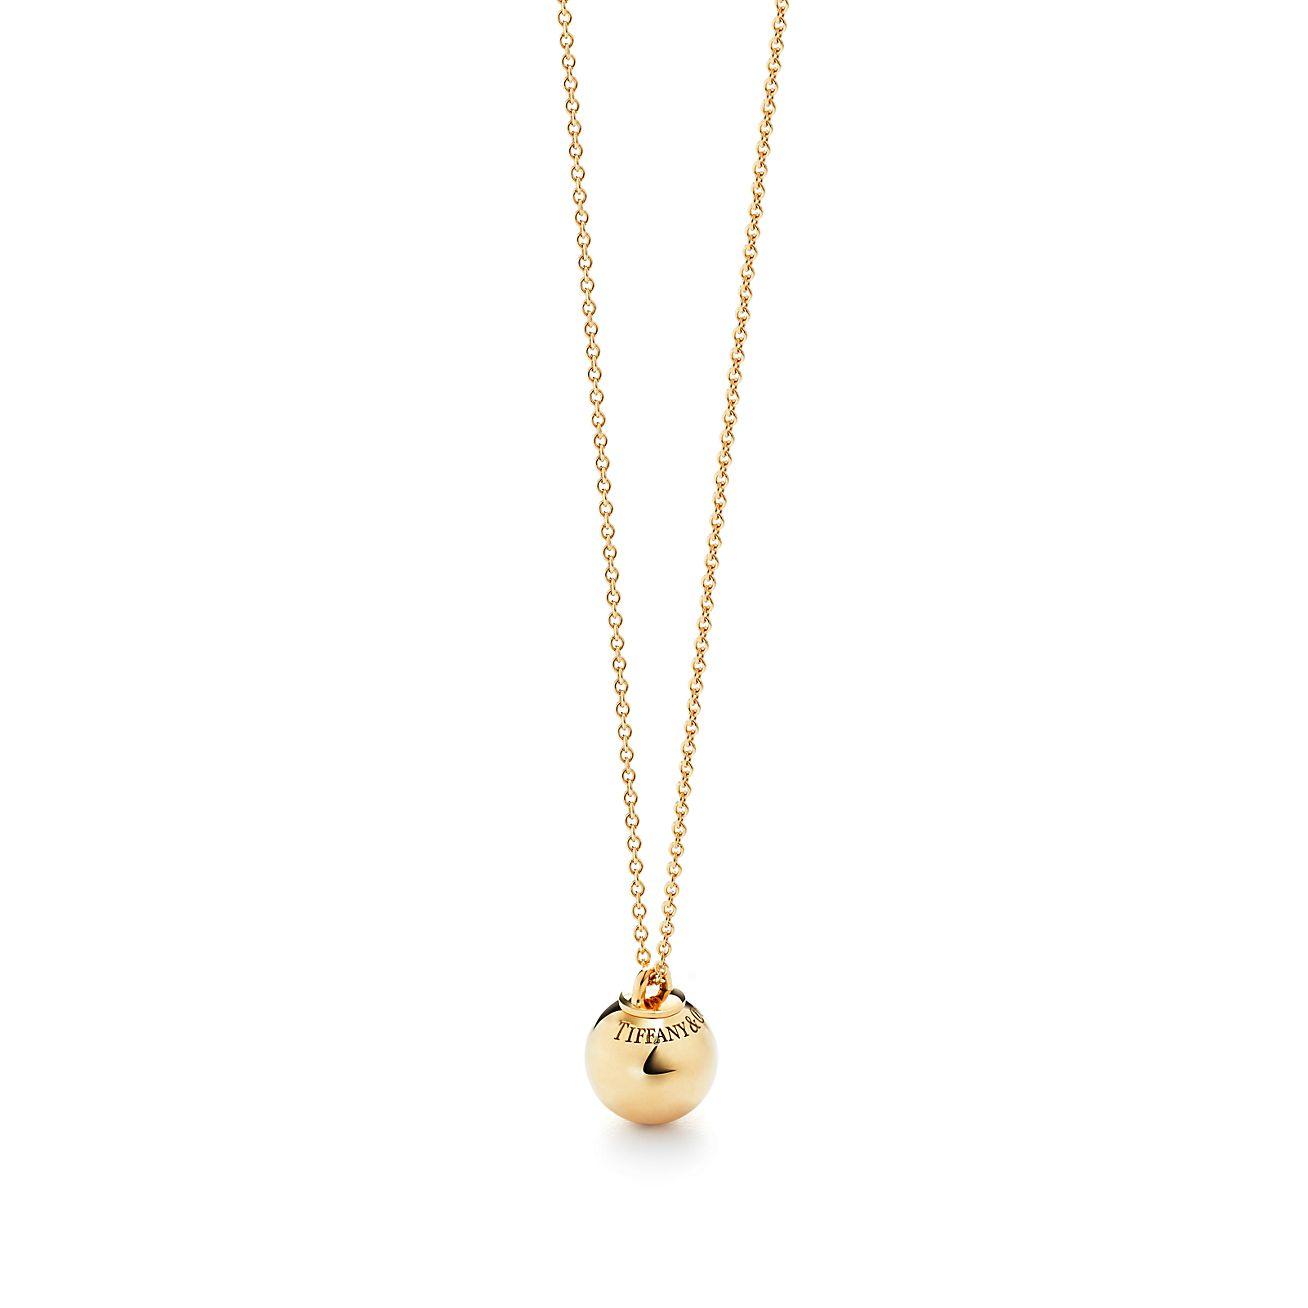 Tiffany City HardWear ball ring in 18ct gold, mini - Size 5 Tiffany & Co.